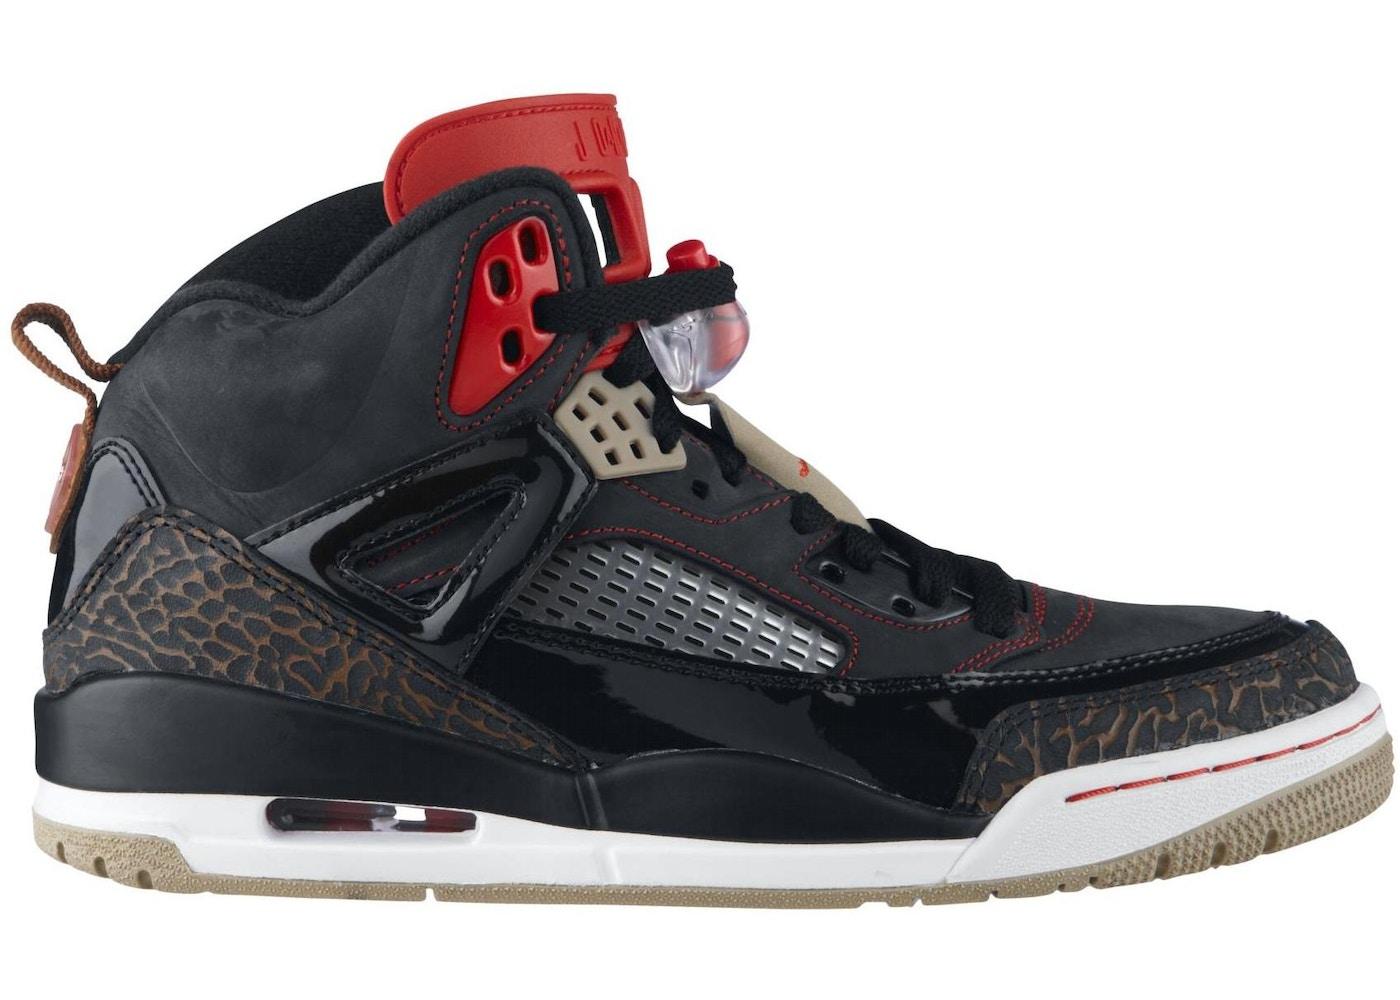 Jordan Spiz ike Challenge Red - 315371-053 c6c73e0c8b